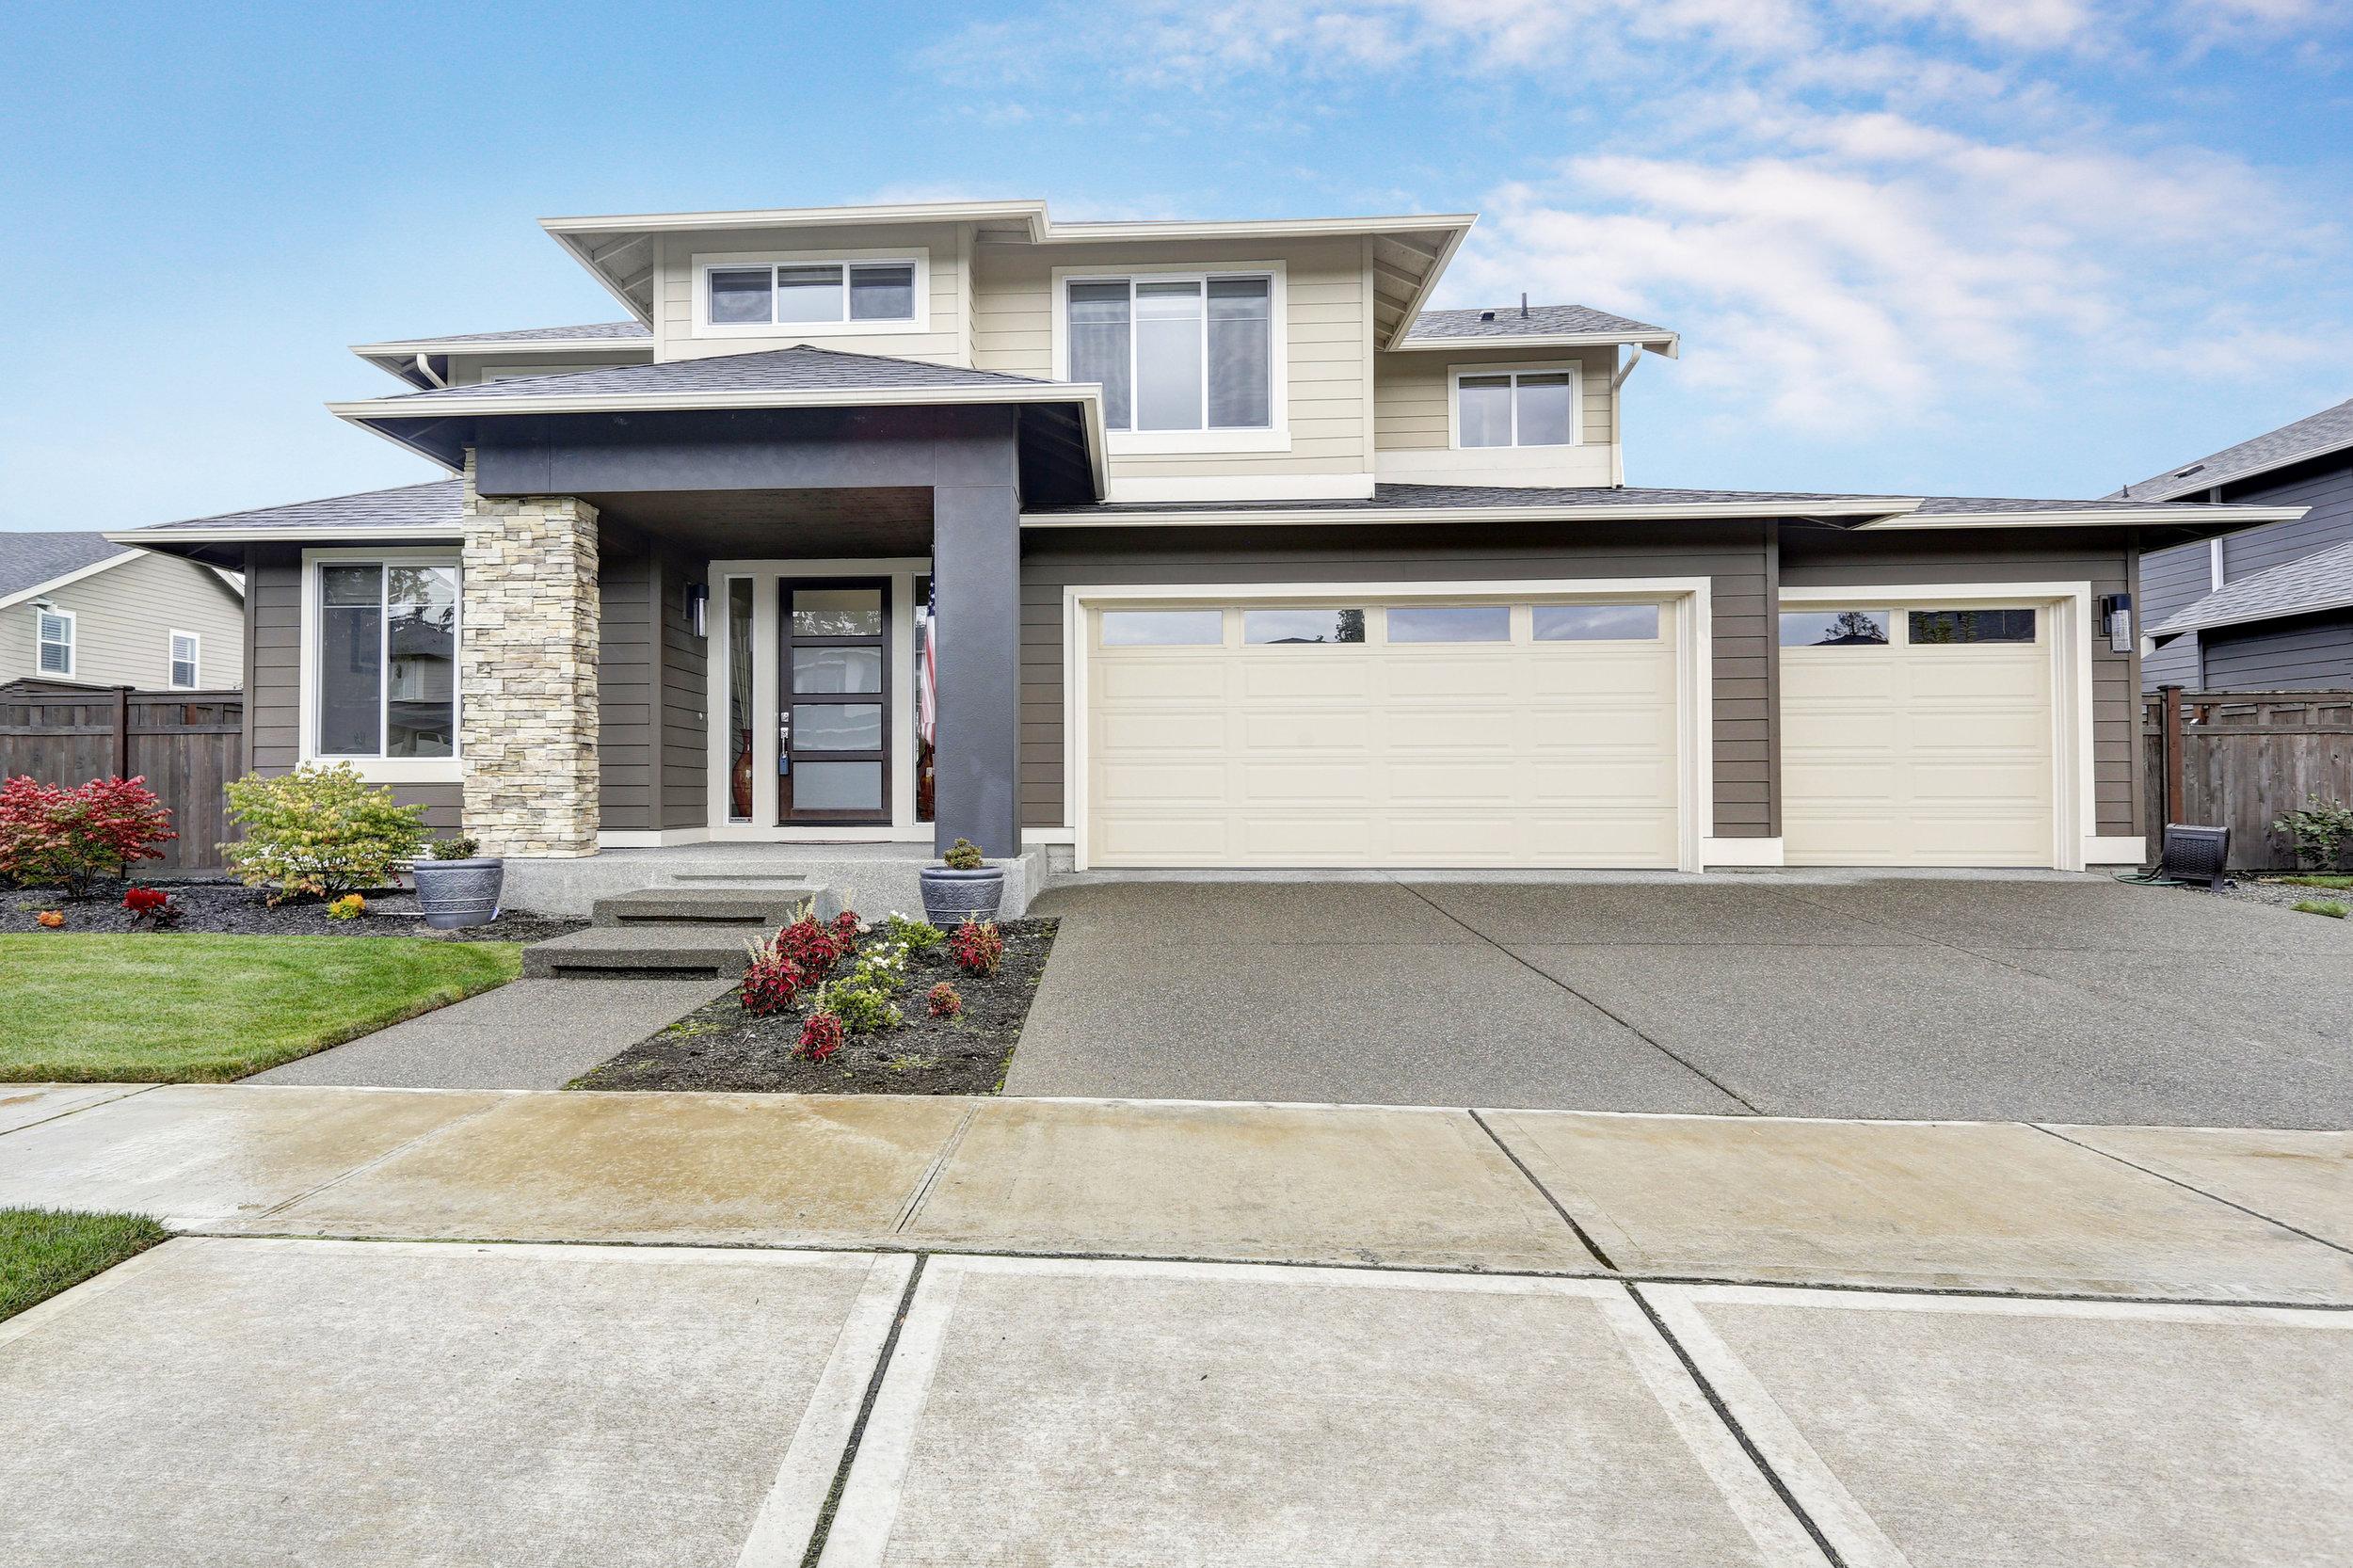 bigstock-Curb-Appeal-Of-Brand-new-Home--155417156.jpg